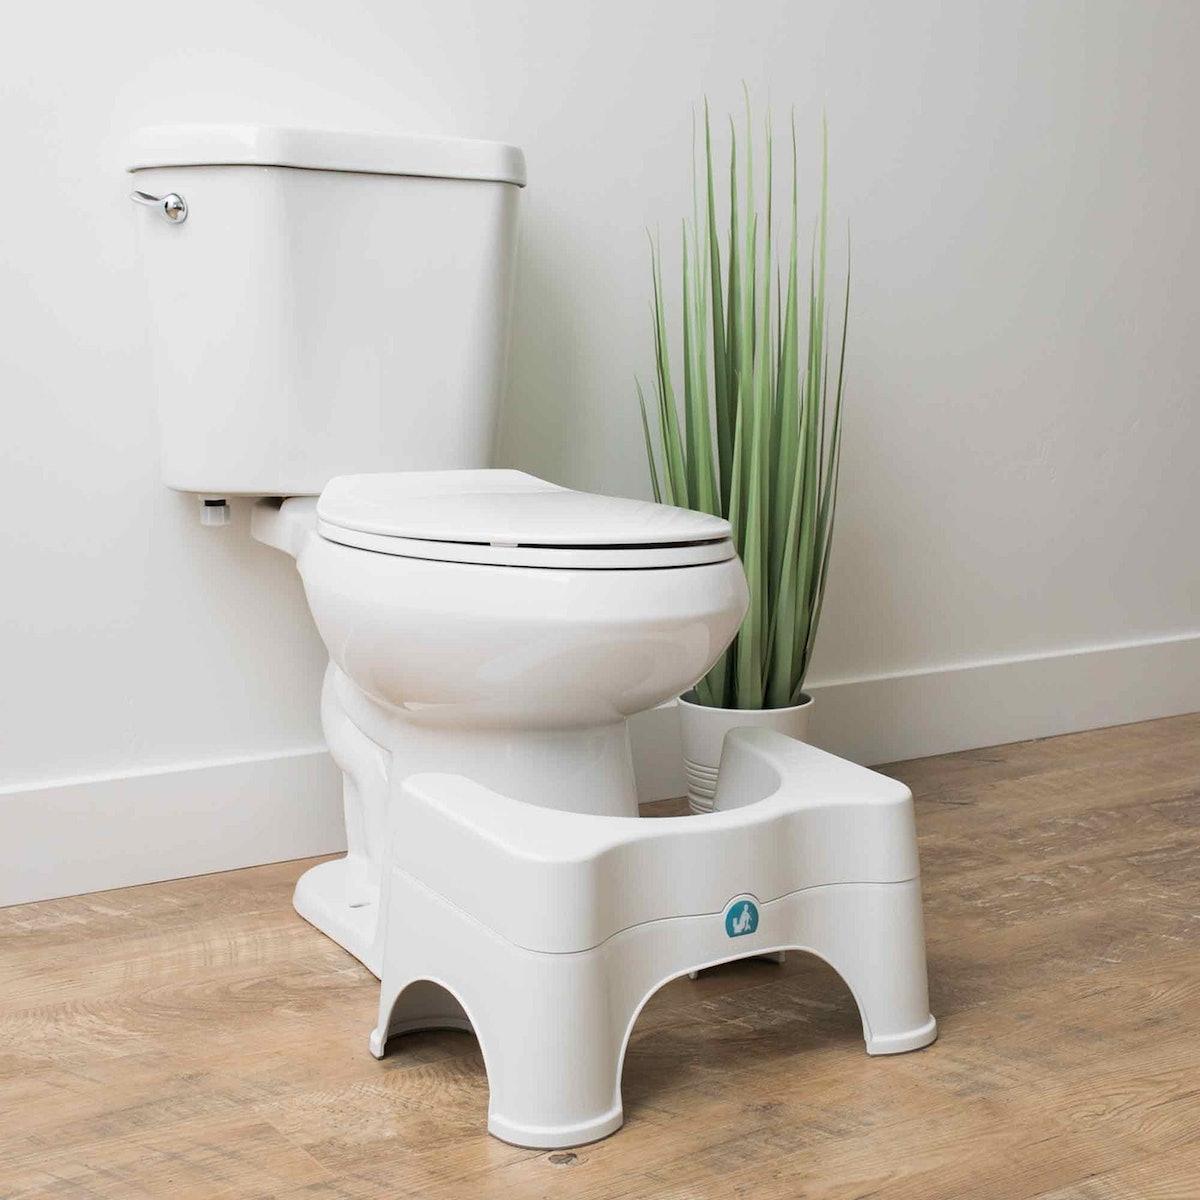 Squatty Potty Bathroom Stool